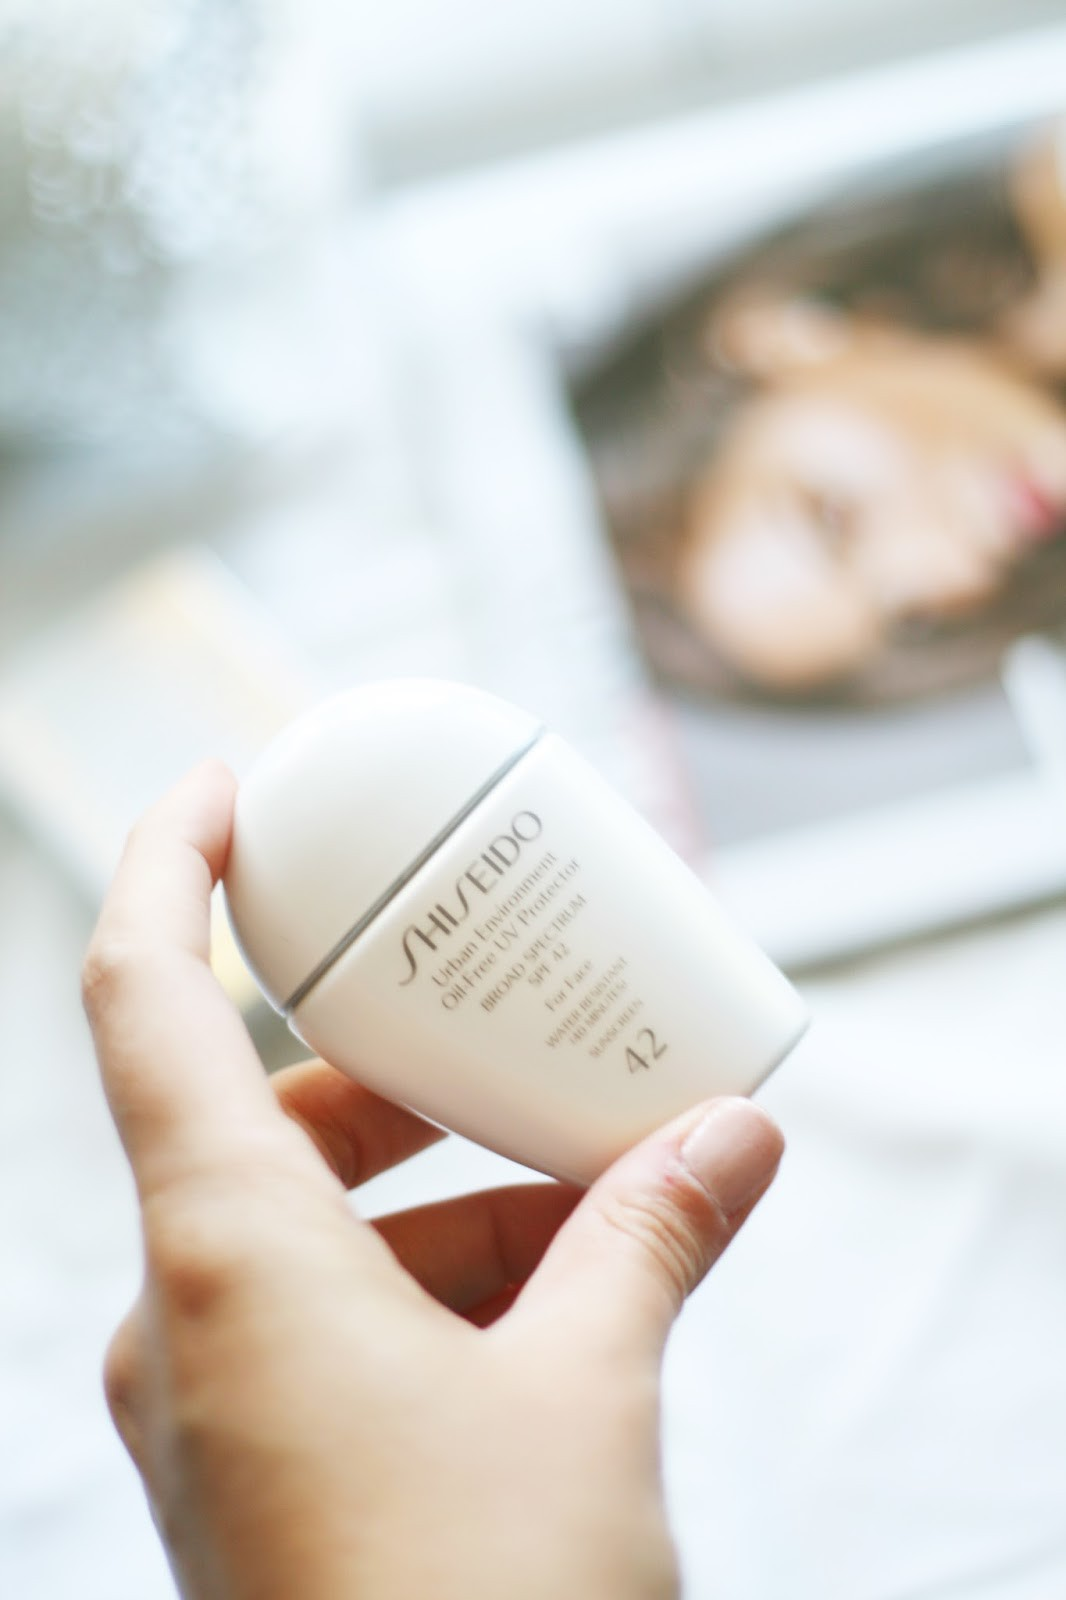 shiseido spf review